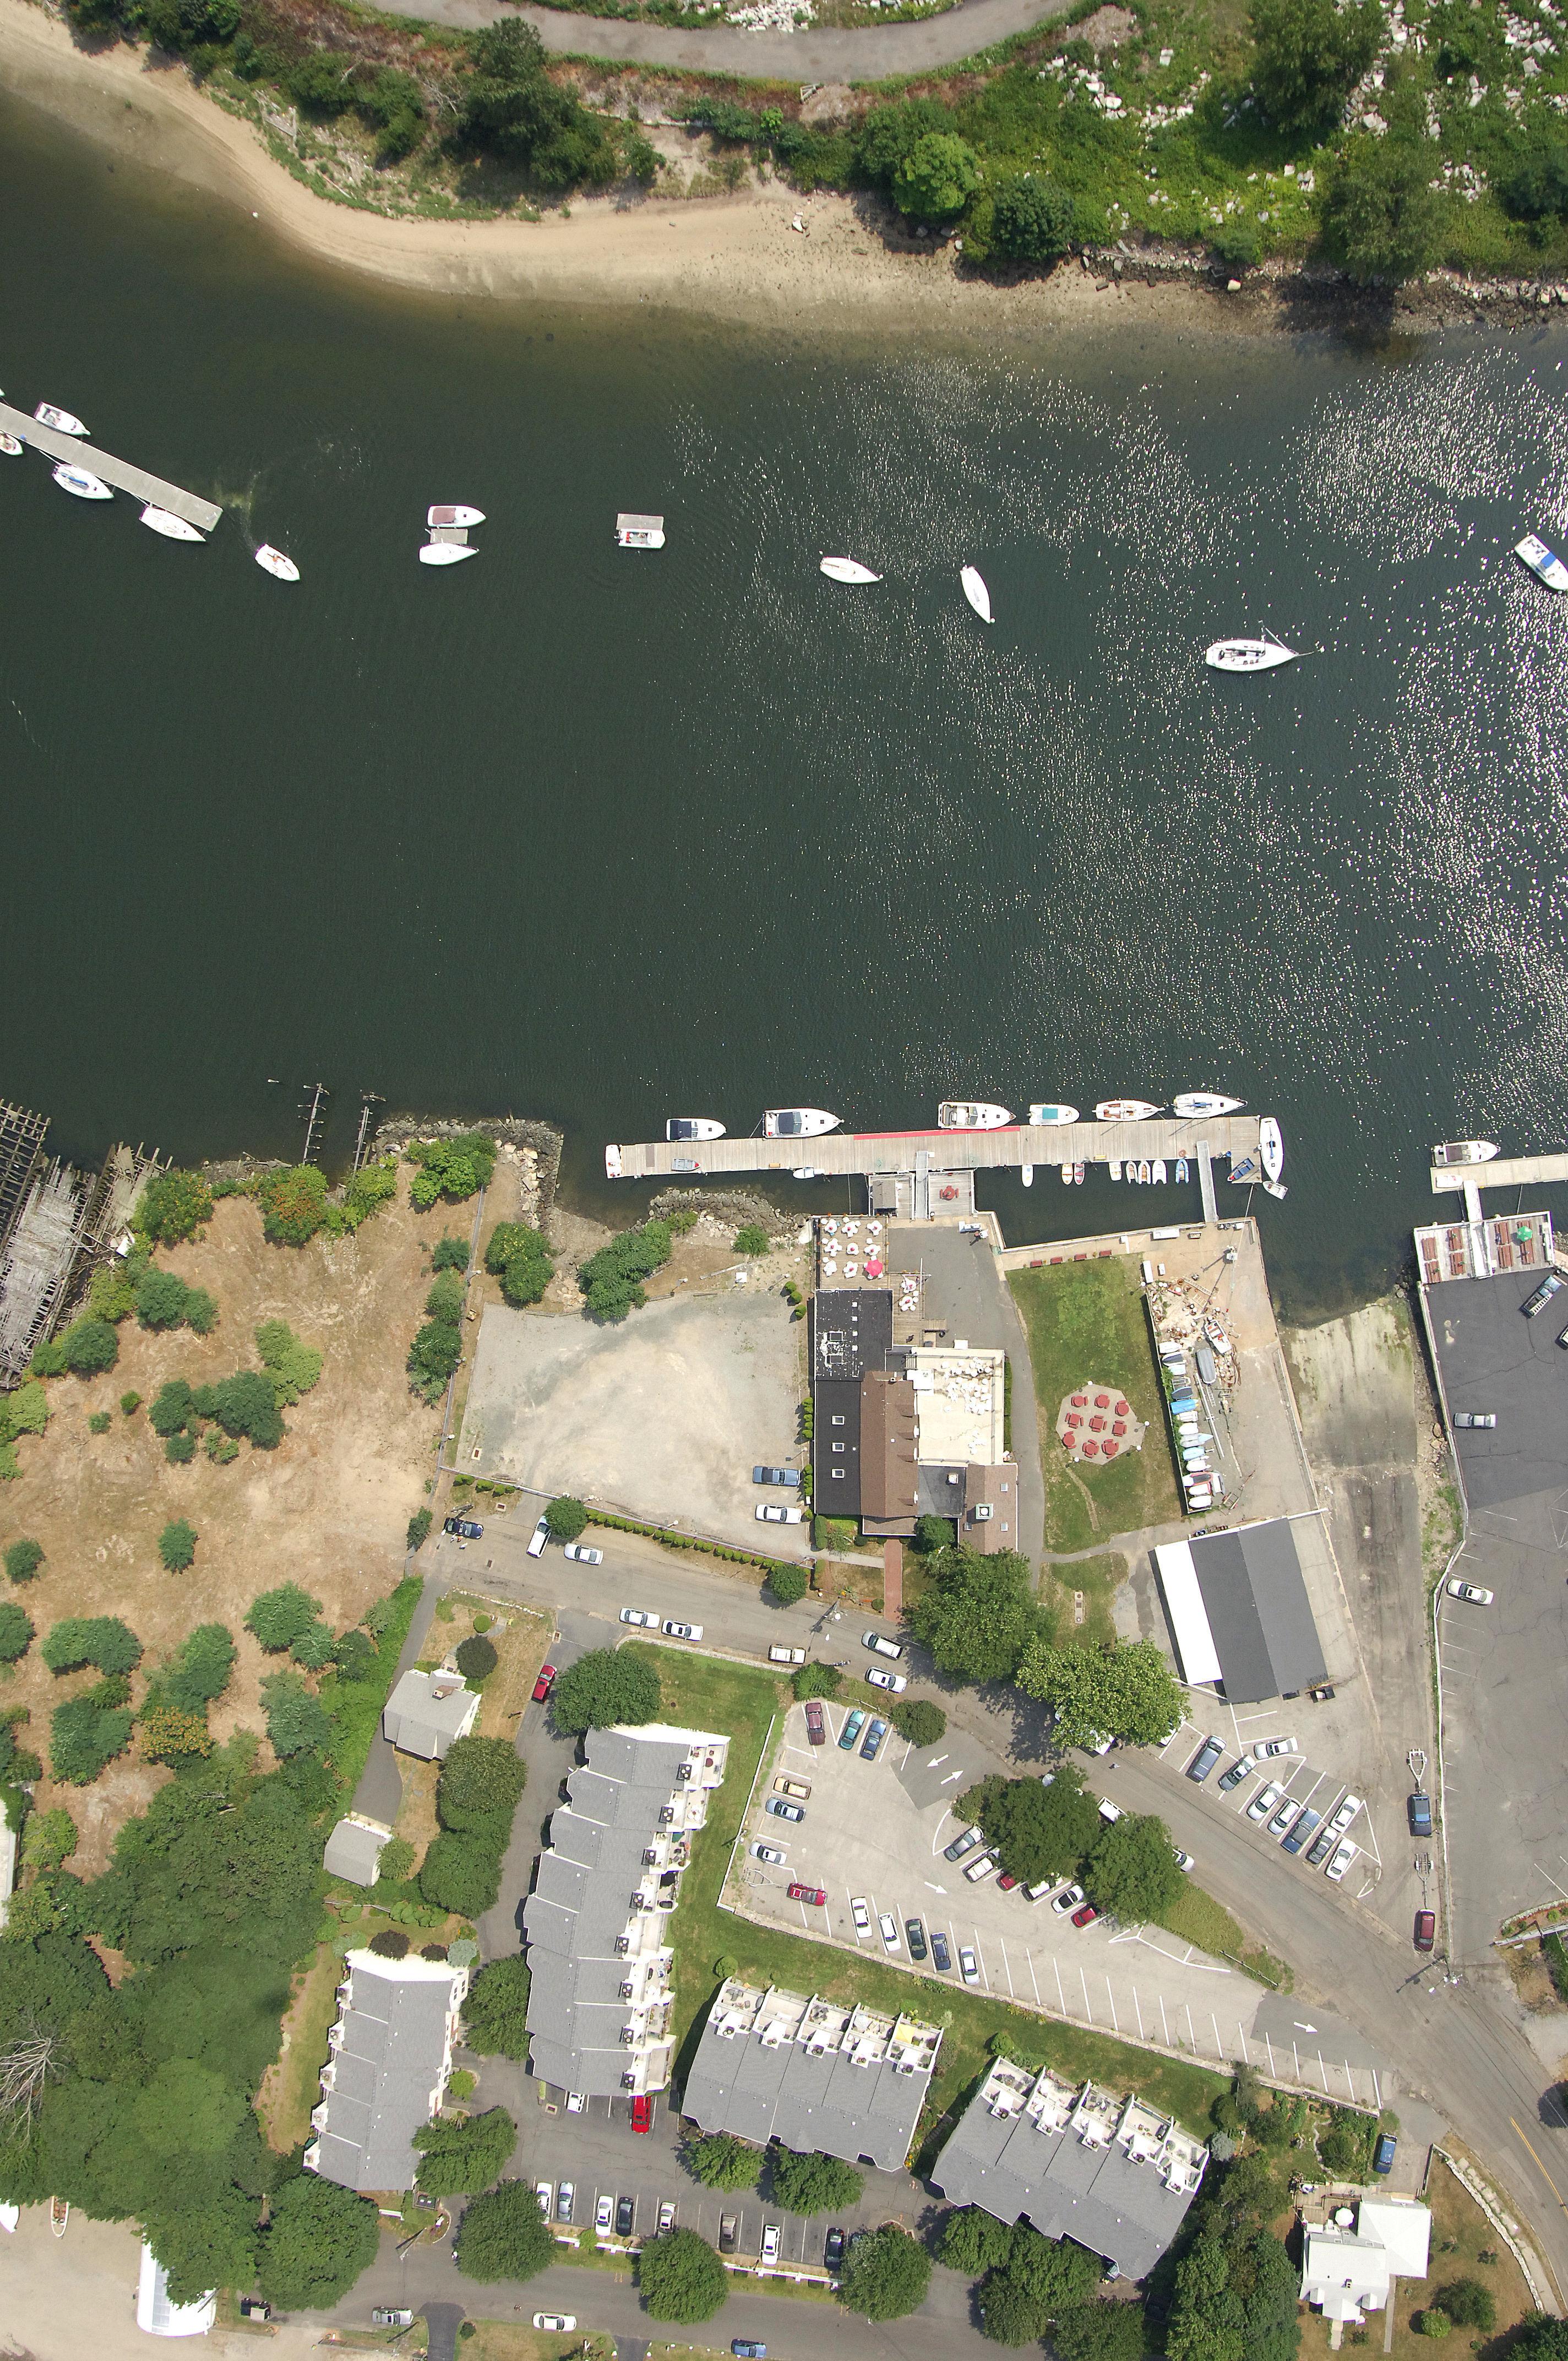 fayerweather yacht club in bridgeport  ct  united states